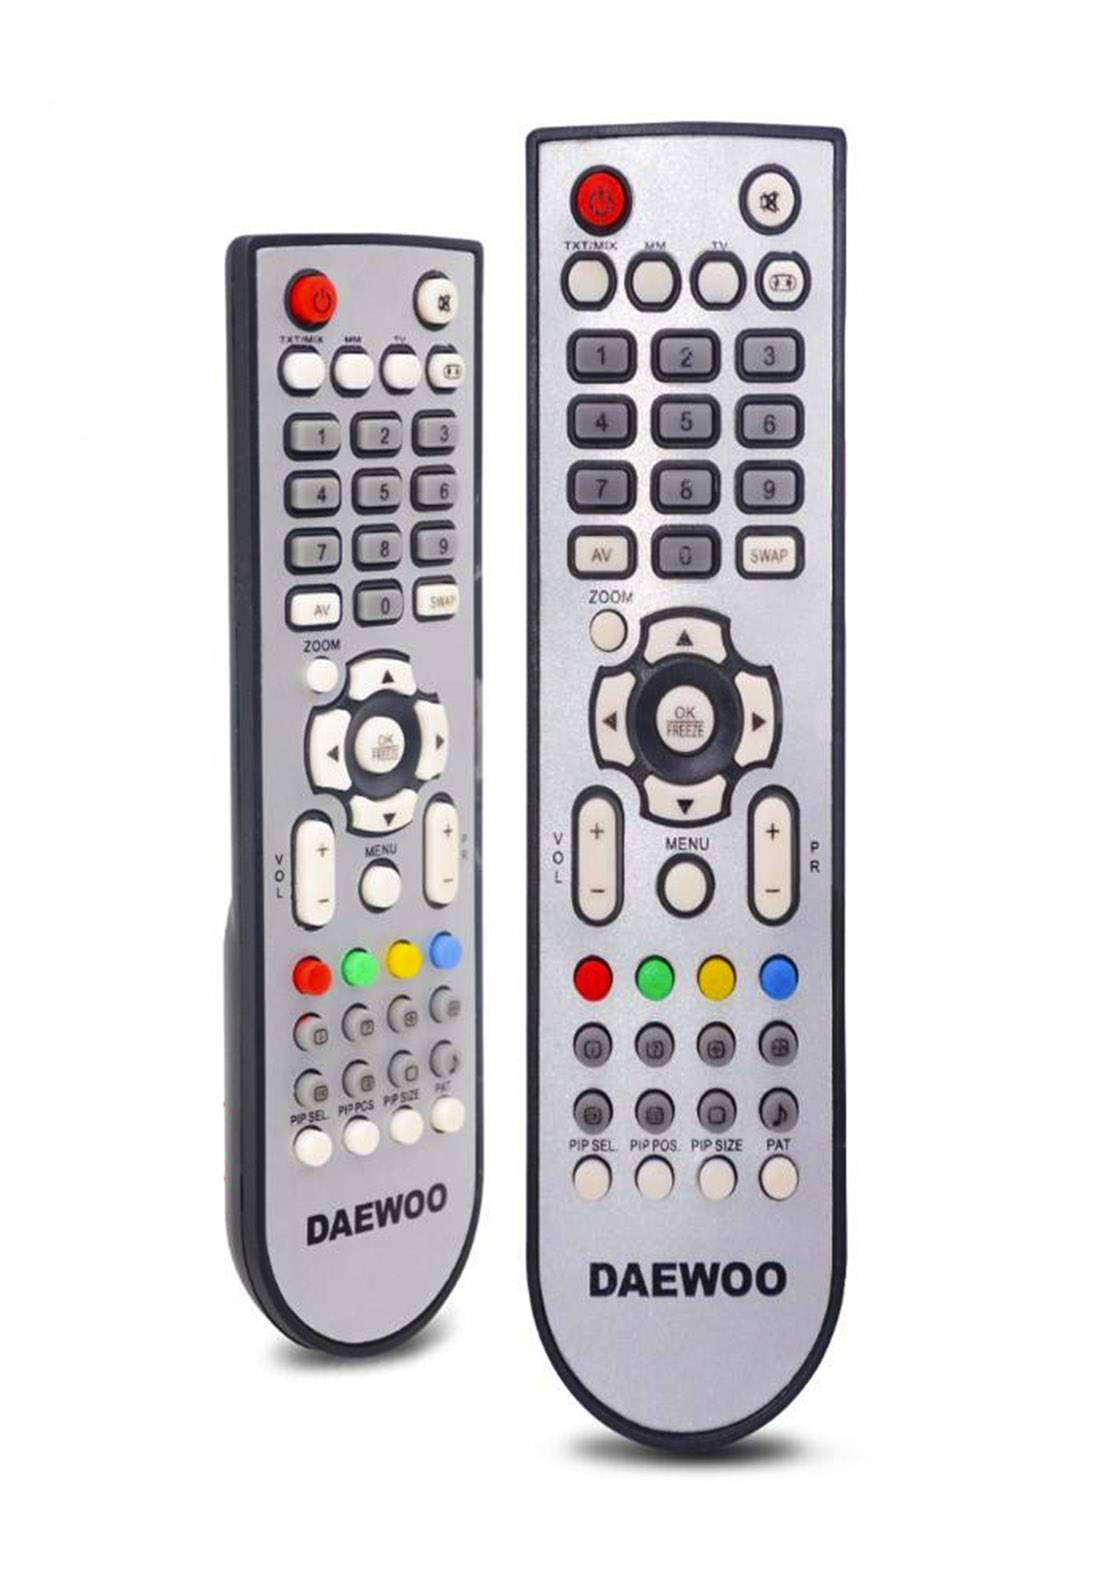 Remote Control For Daewoo Plasma TV - Gray (AAU) جهاز تحكم عن بعد